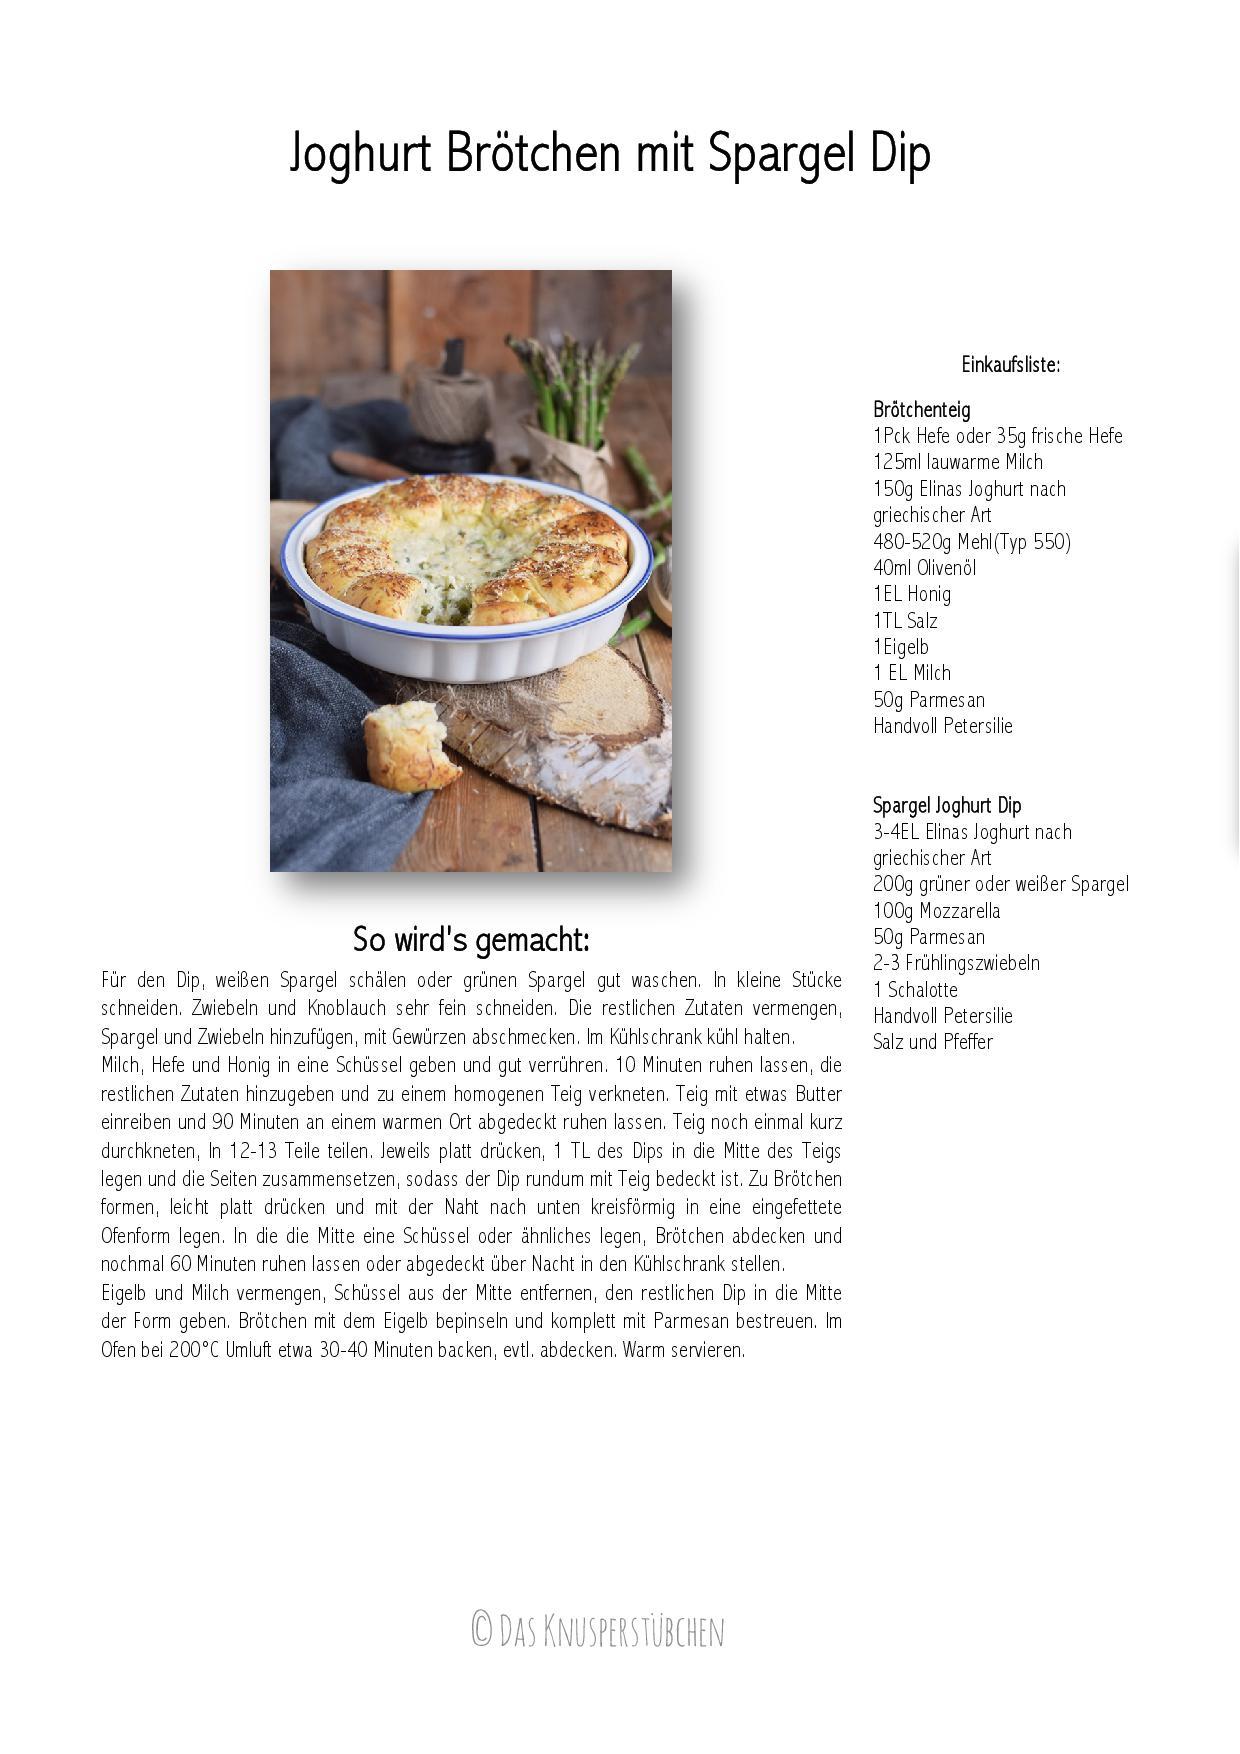 Joghurt Broetchen mit Spargel Dip Rezept-001